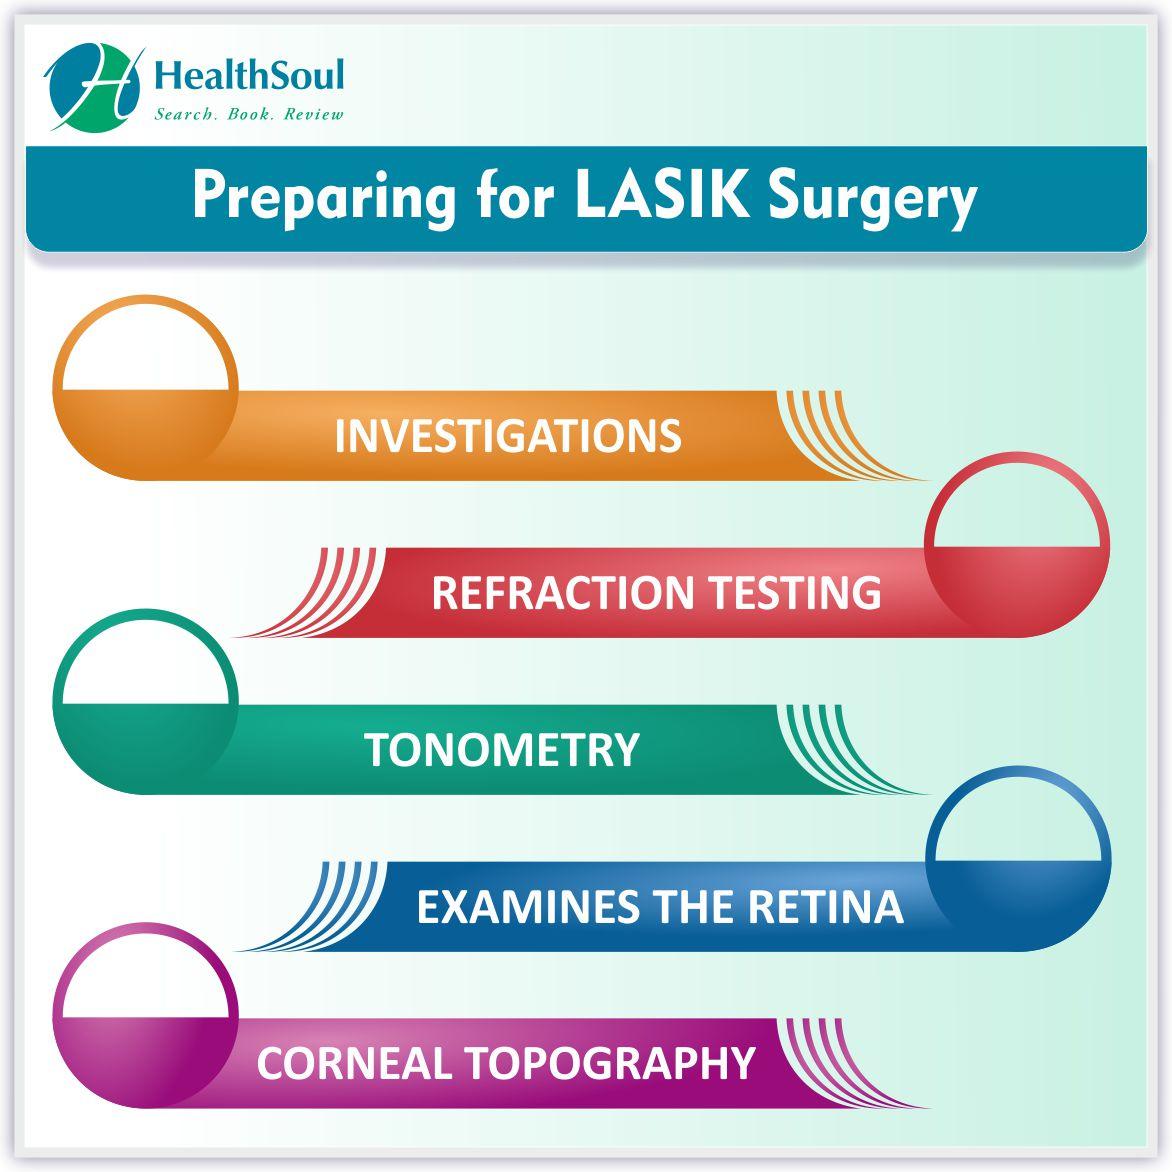 Preparing for LASIK Surgery | HealthSoul